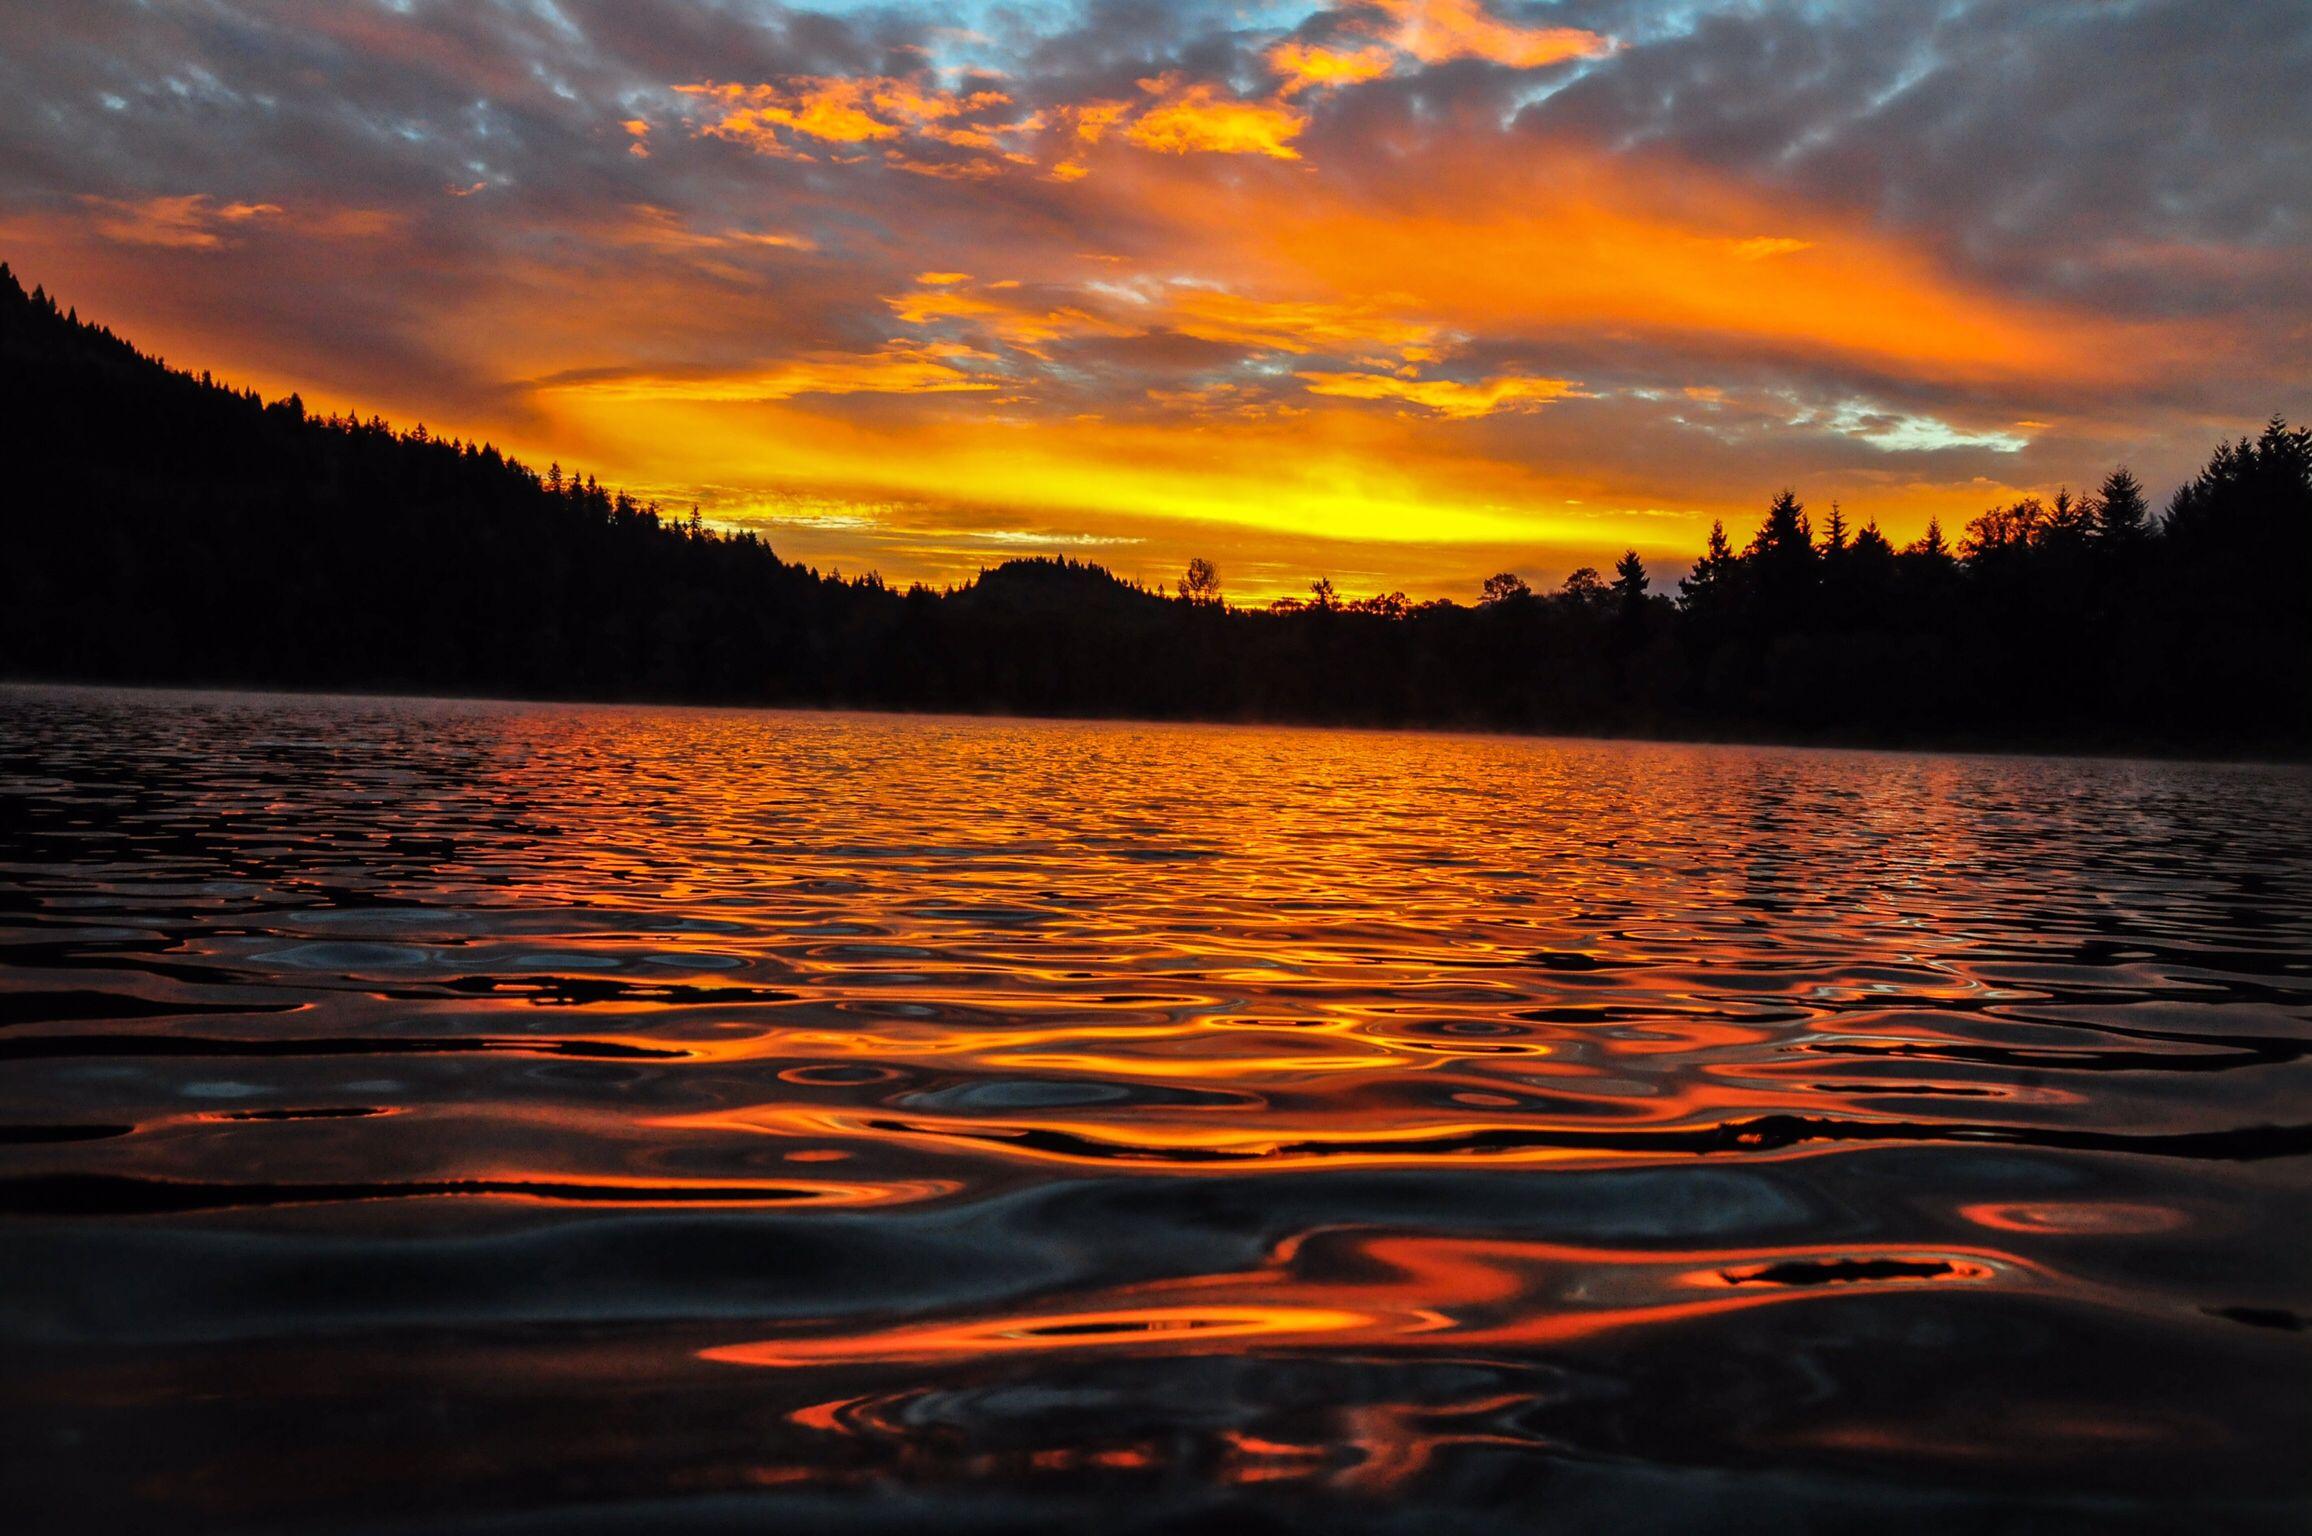 kress lake. sunrise at kress lake in kalama wa i